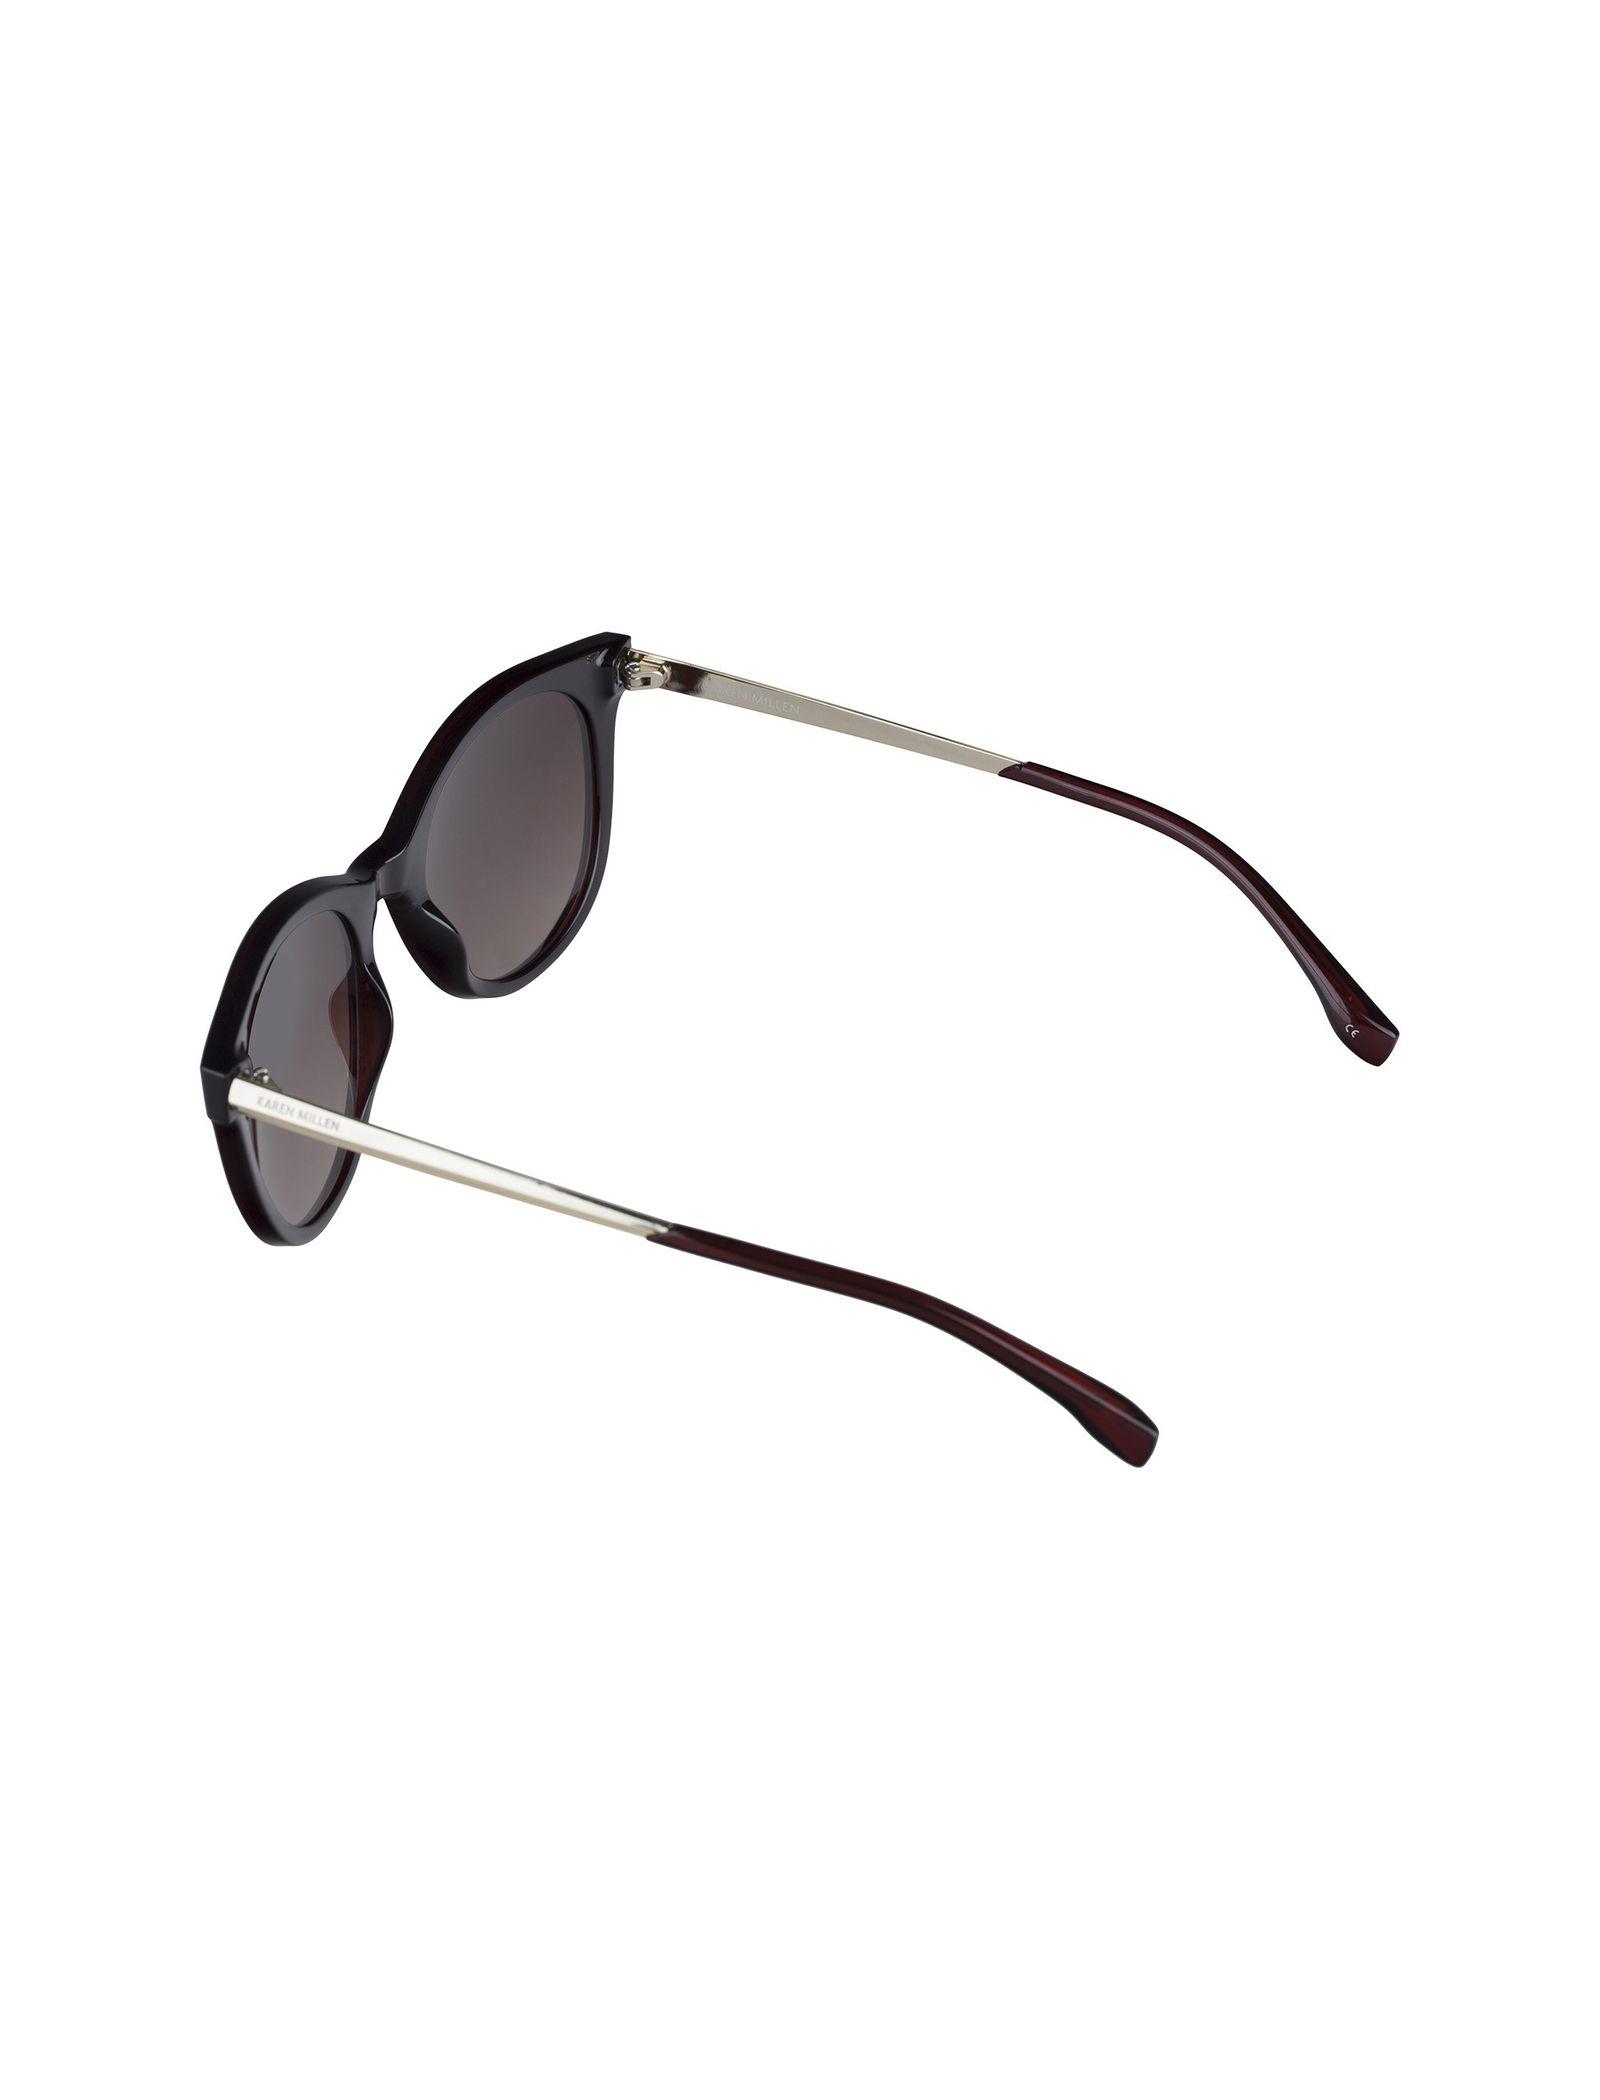 عینک آفتابی ویفرر زنانه - کارن میلن - قهوه اي - 5